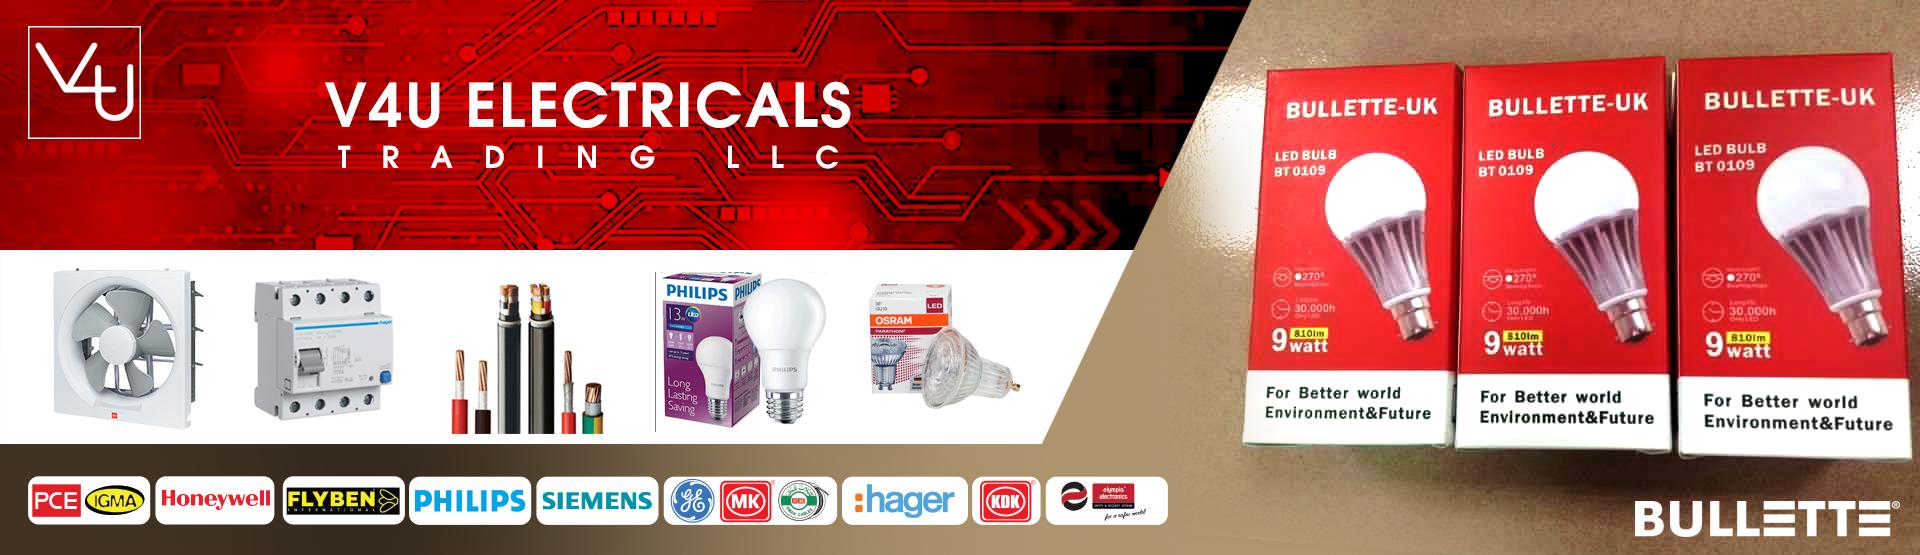 V4U ELECTRICALS TRADING LLC